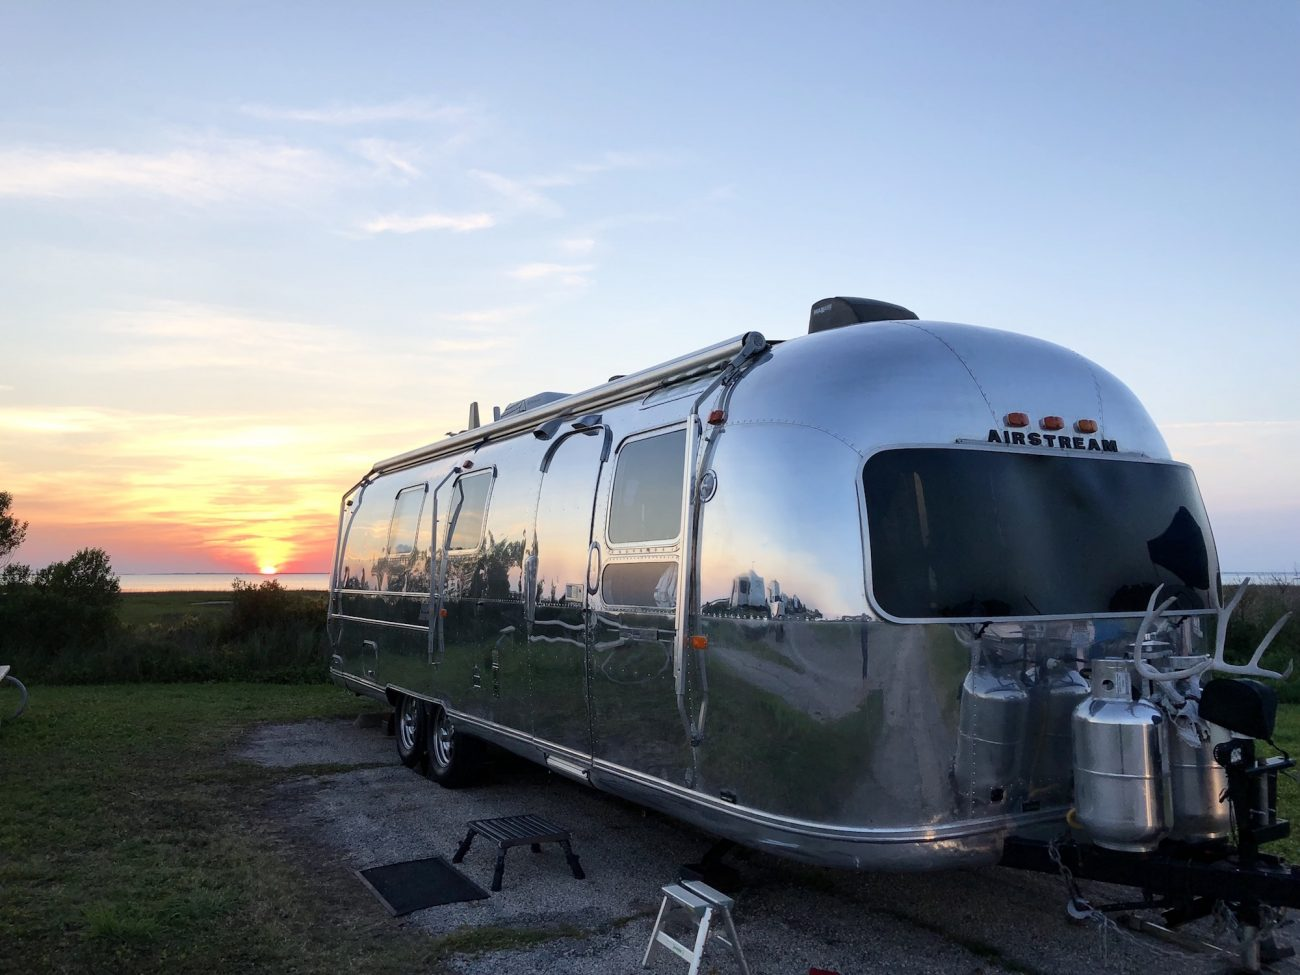 Vintage Airstream at Sunset